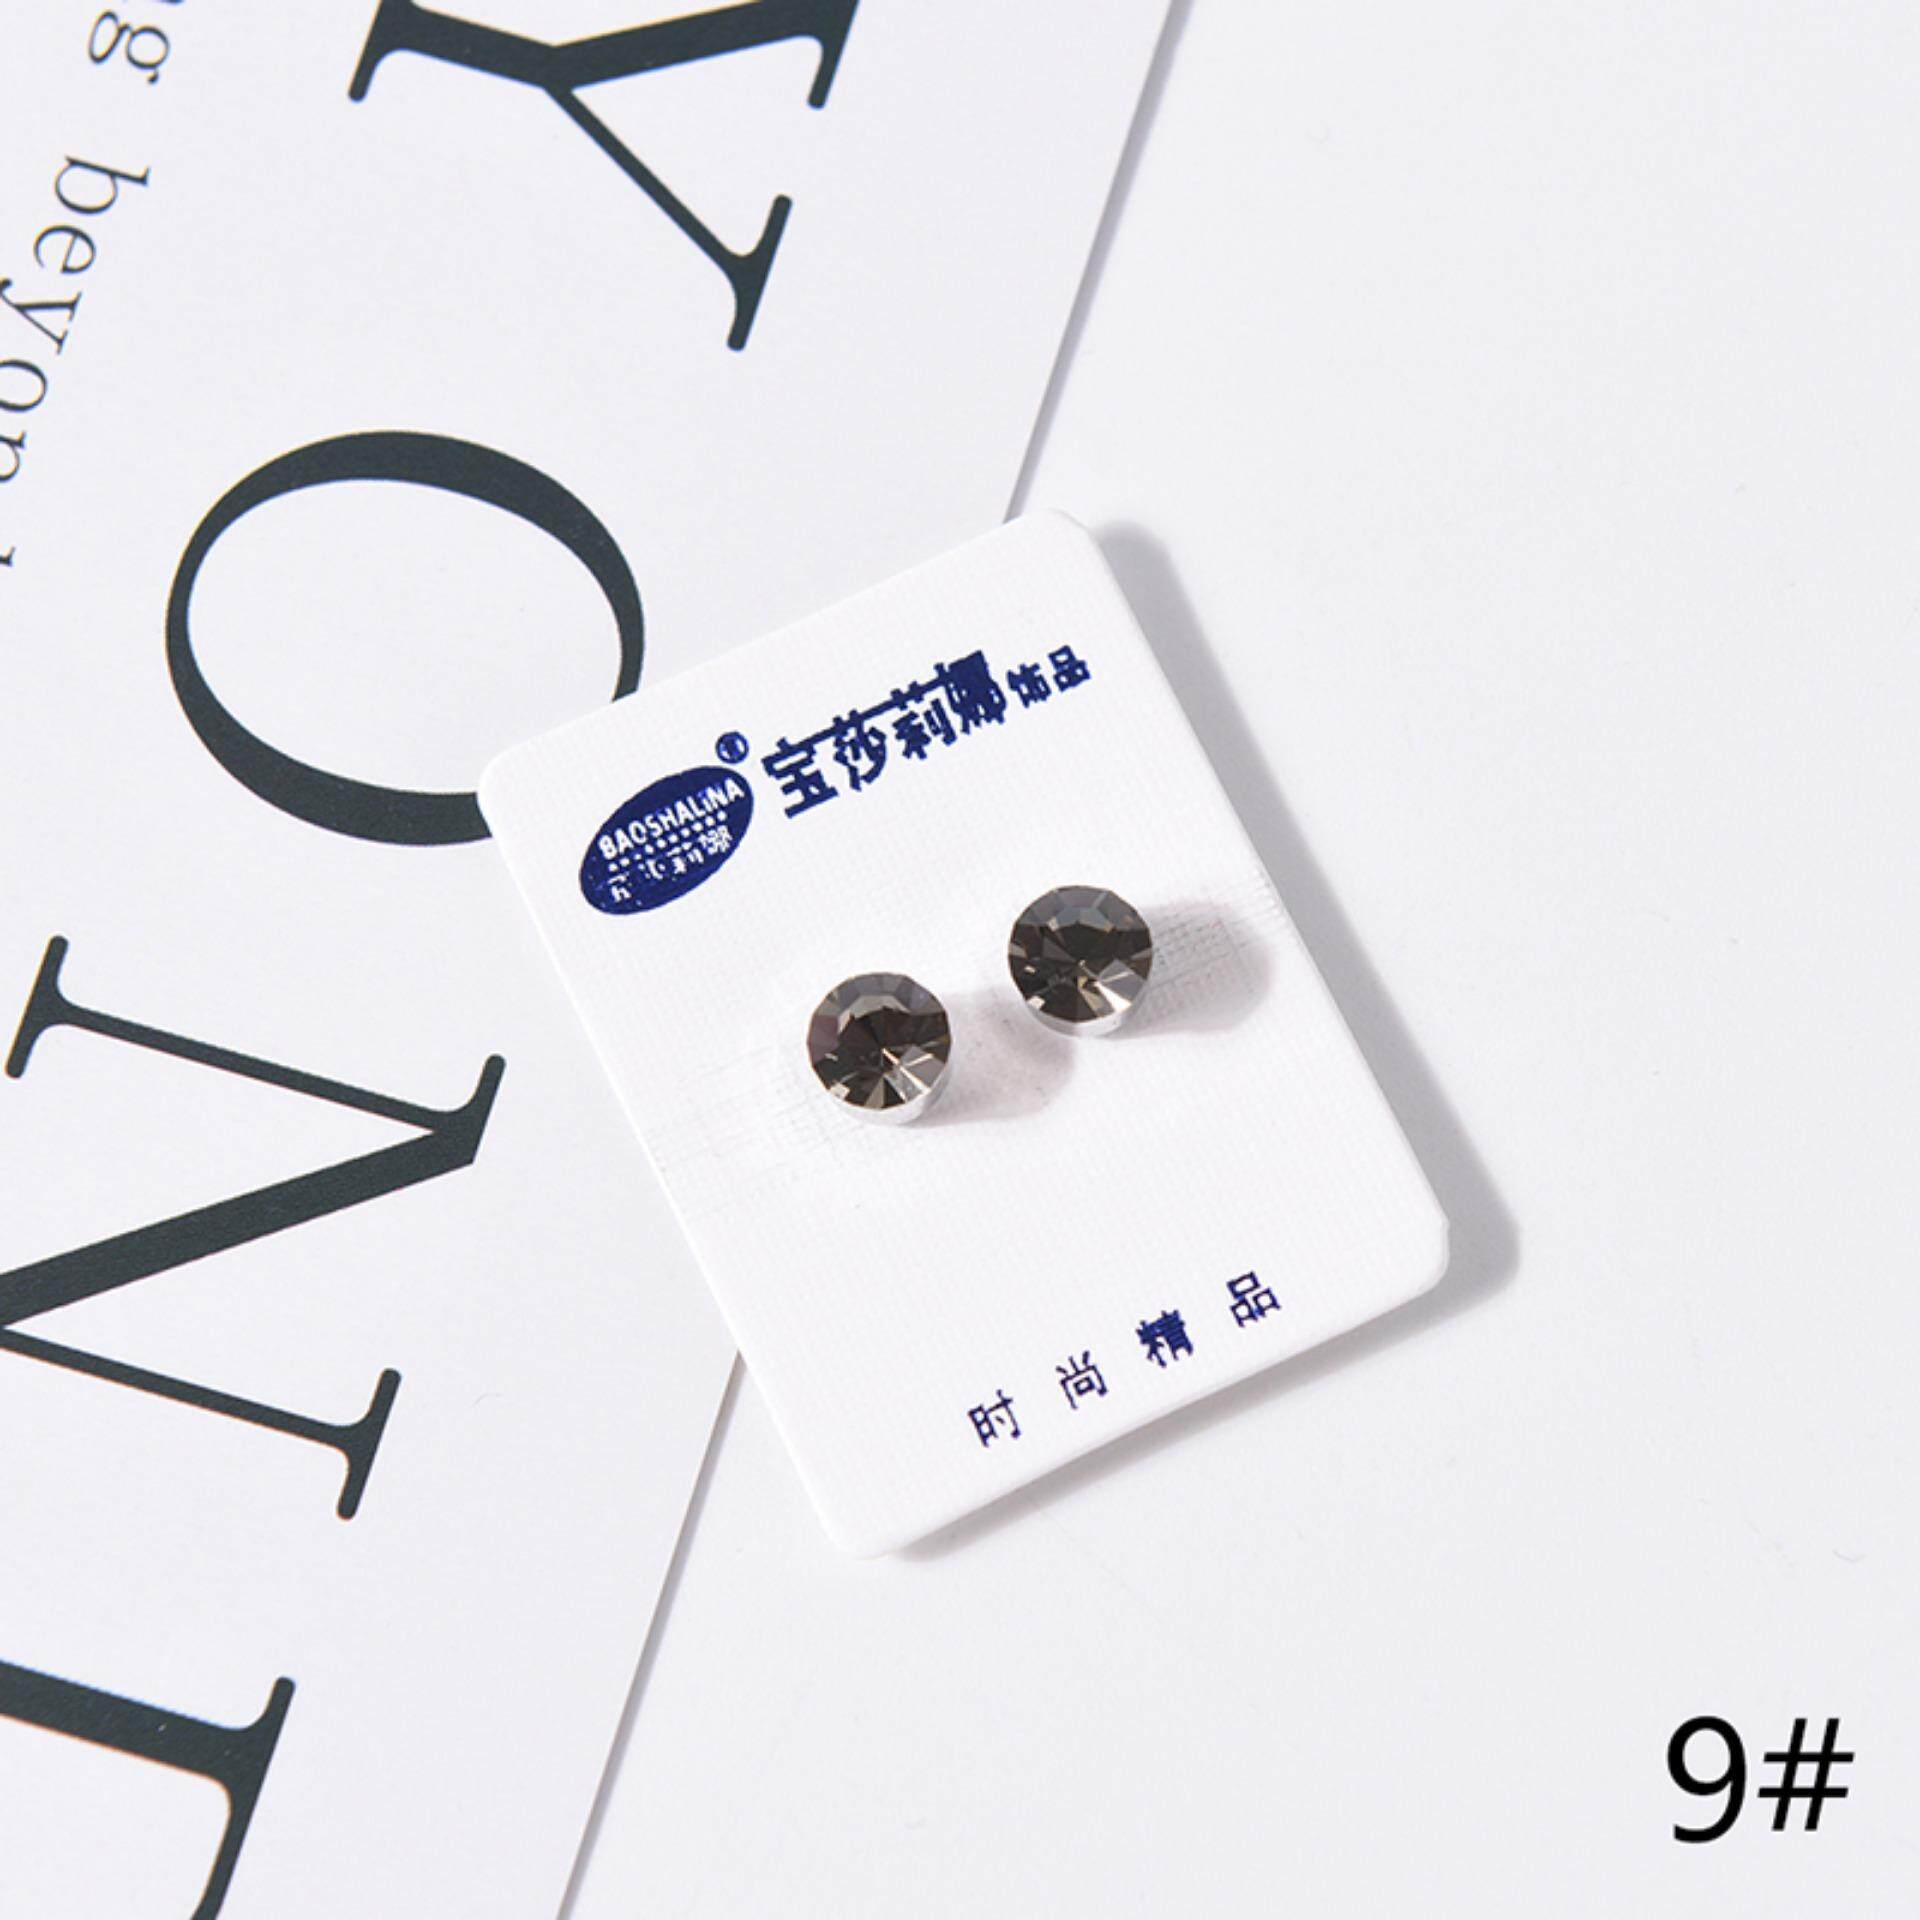 Magnetic Healthcare Earring Weight Loss Earrings Slimming Ear Healthy Earring Magnetic Therapy Type:N9 - intl